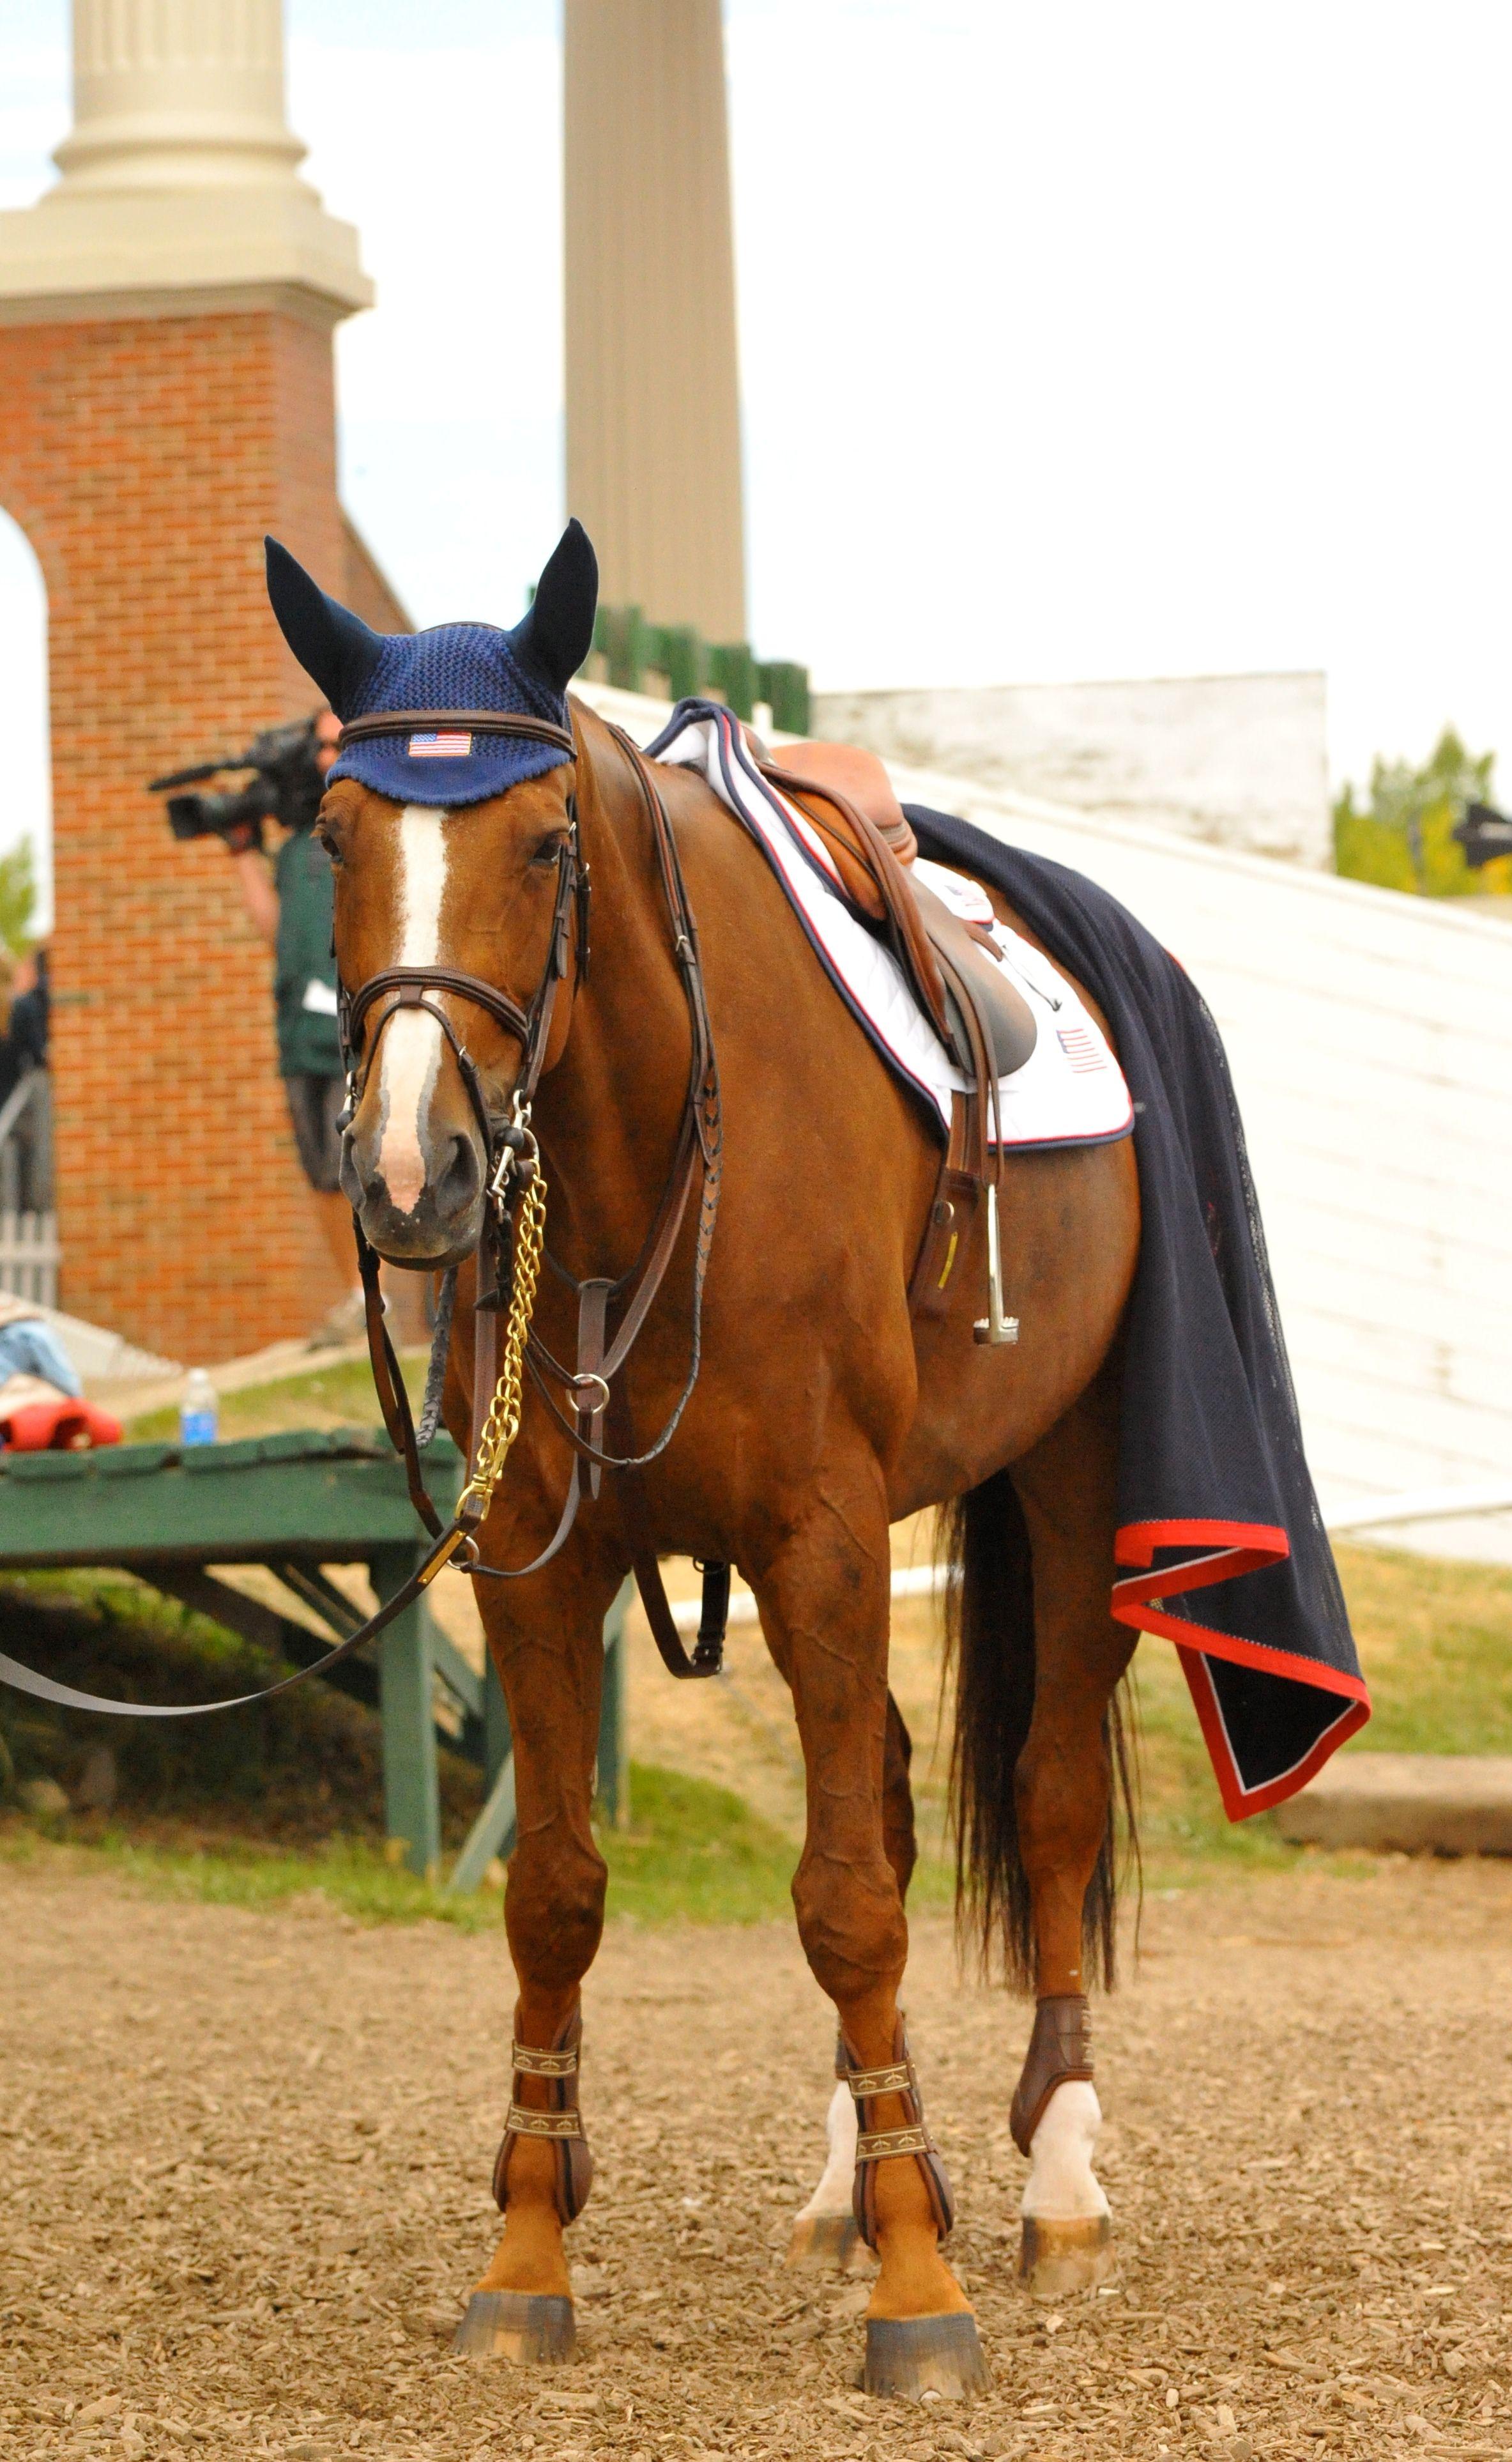 Im ready horses horse photography horse love